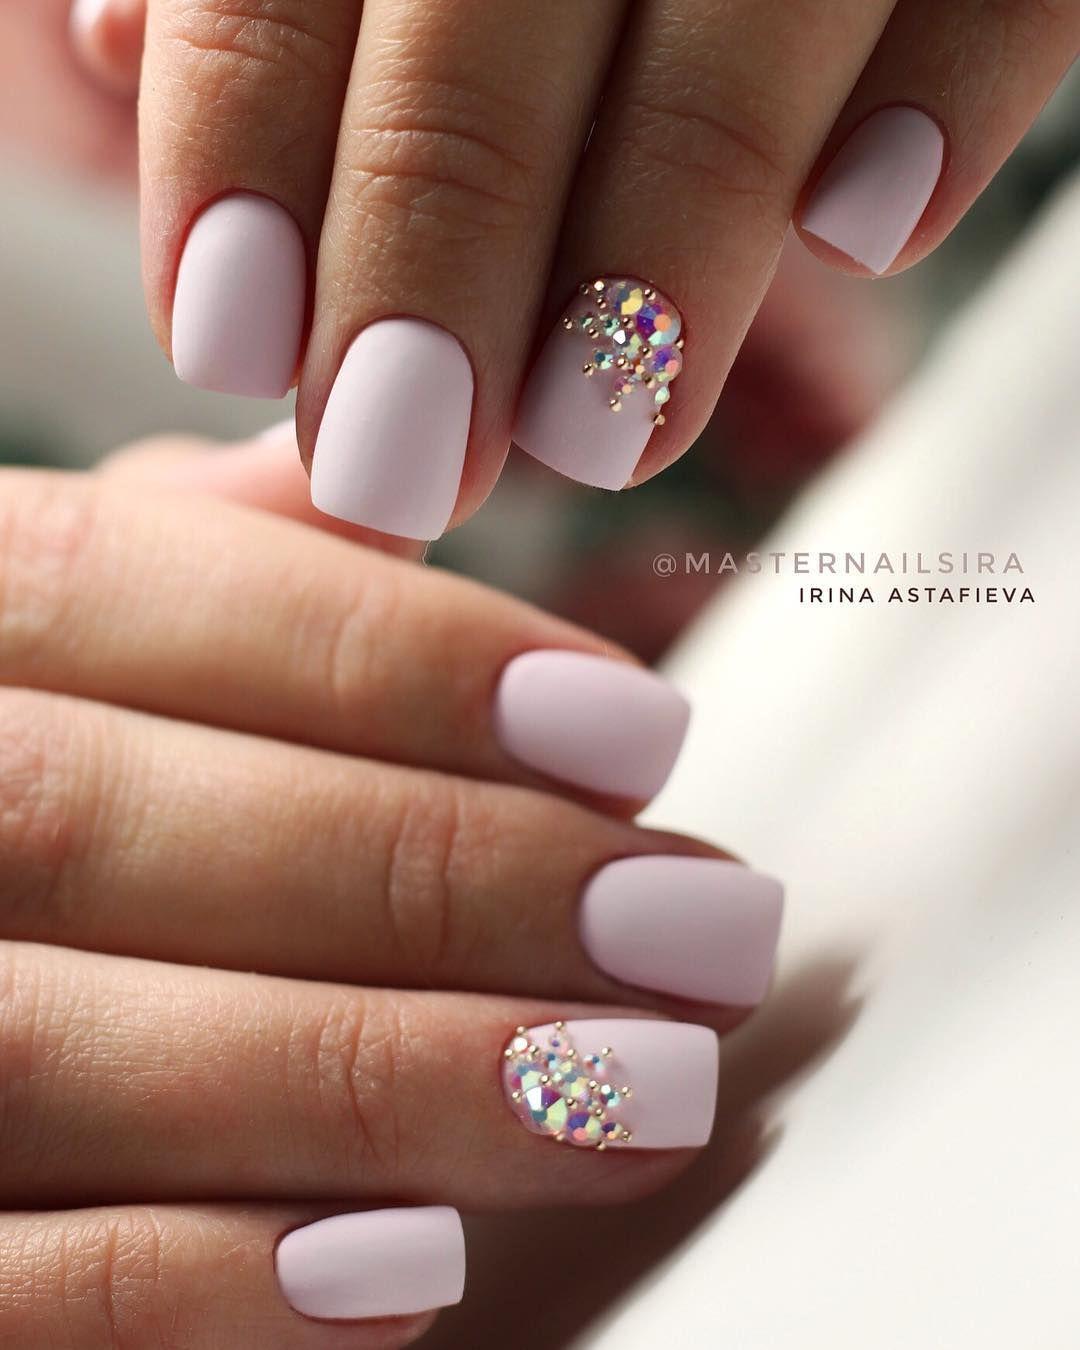 48 Stylish Acrylic White Nail Art Designs And Ideas Short Acrylic Nails Designs Bride Nails Short Acrylic Nails